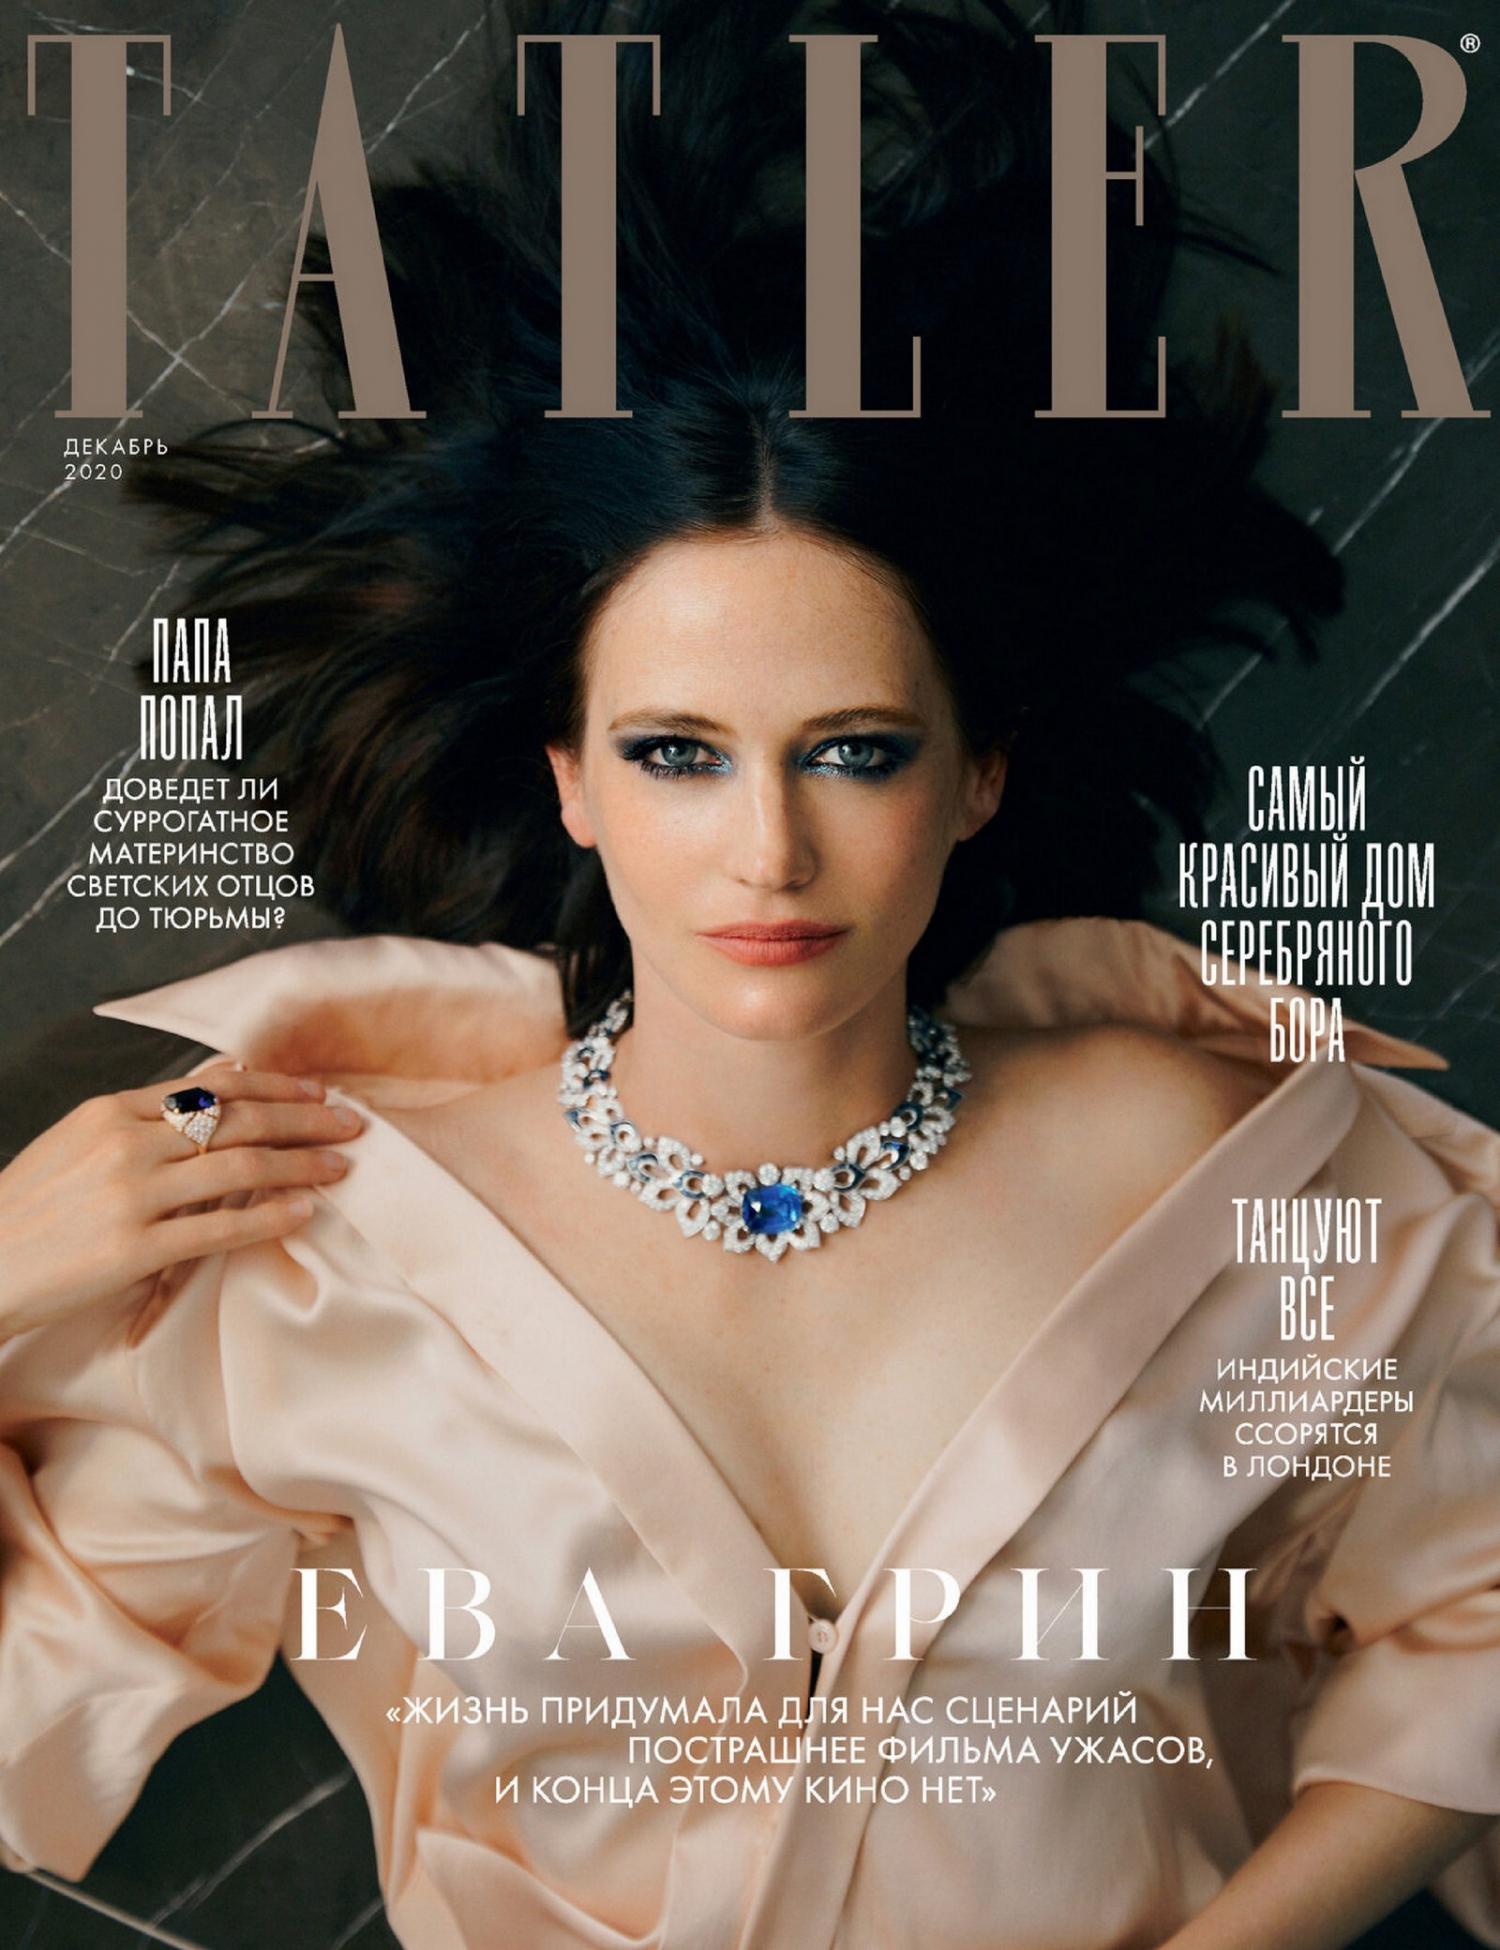 Eva Green covers Tatler Russia December 2020 by Javier Biosca